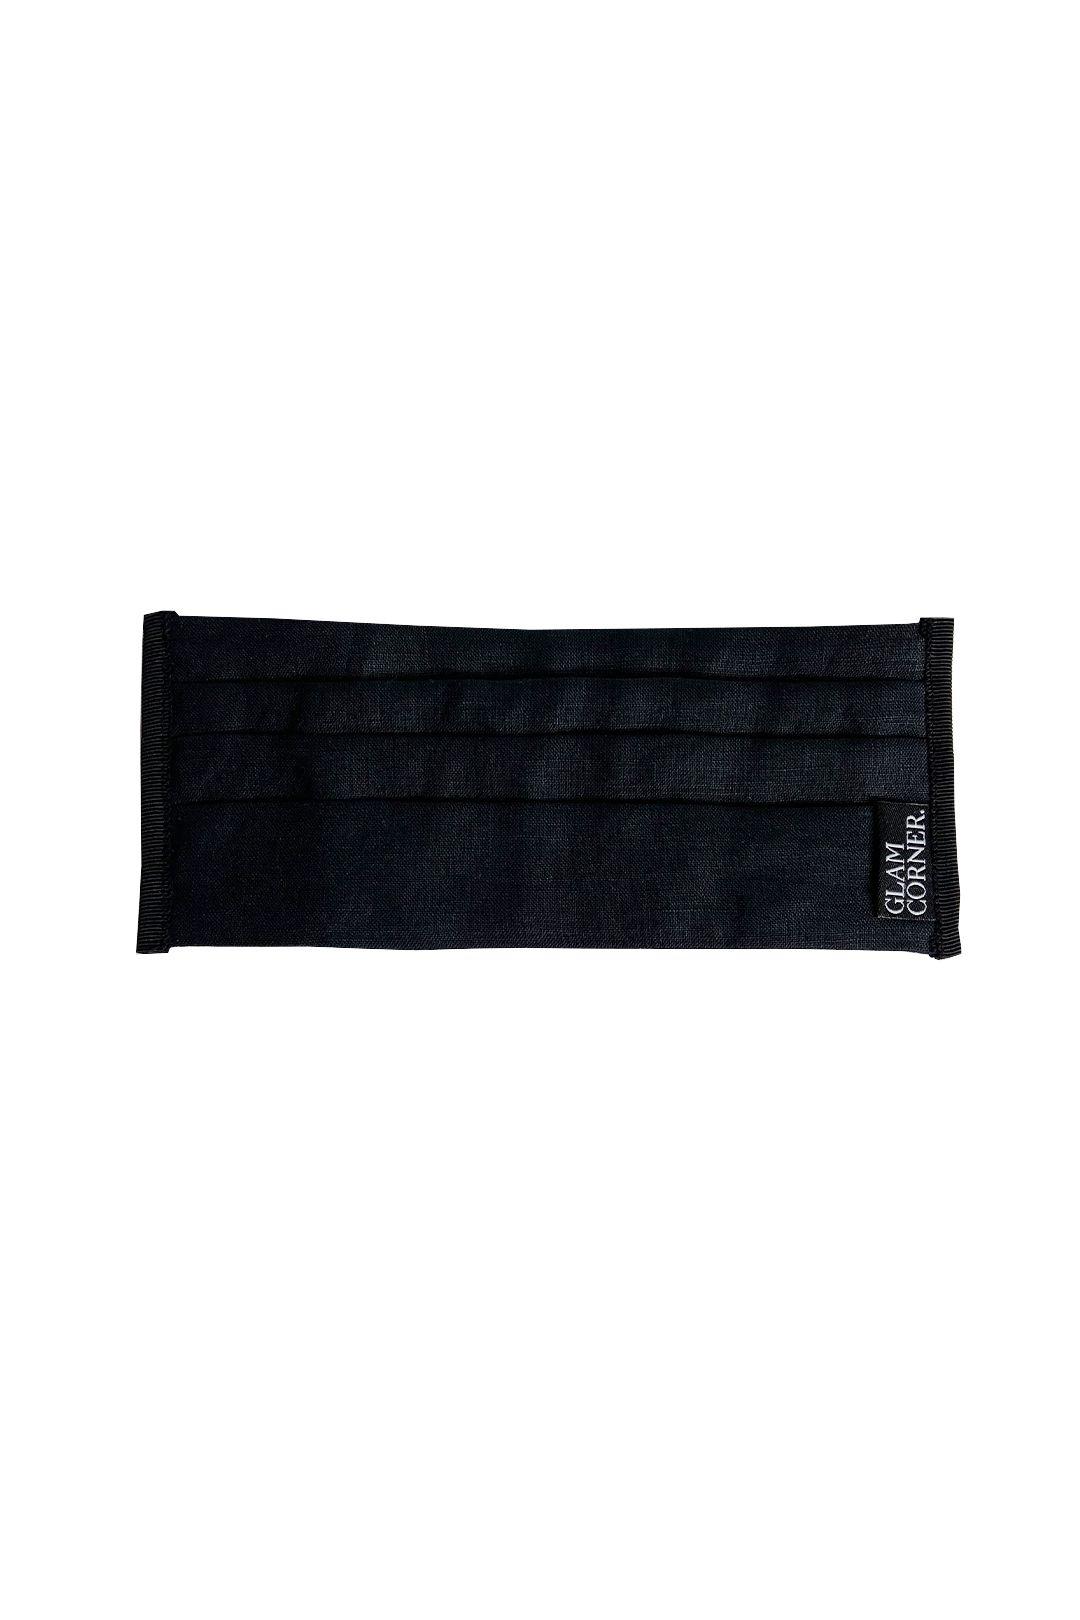 GlamCorner-Three-Layered-Fabric-FaceMasks-Black-Product